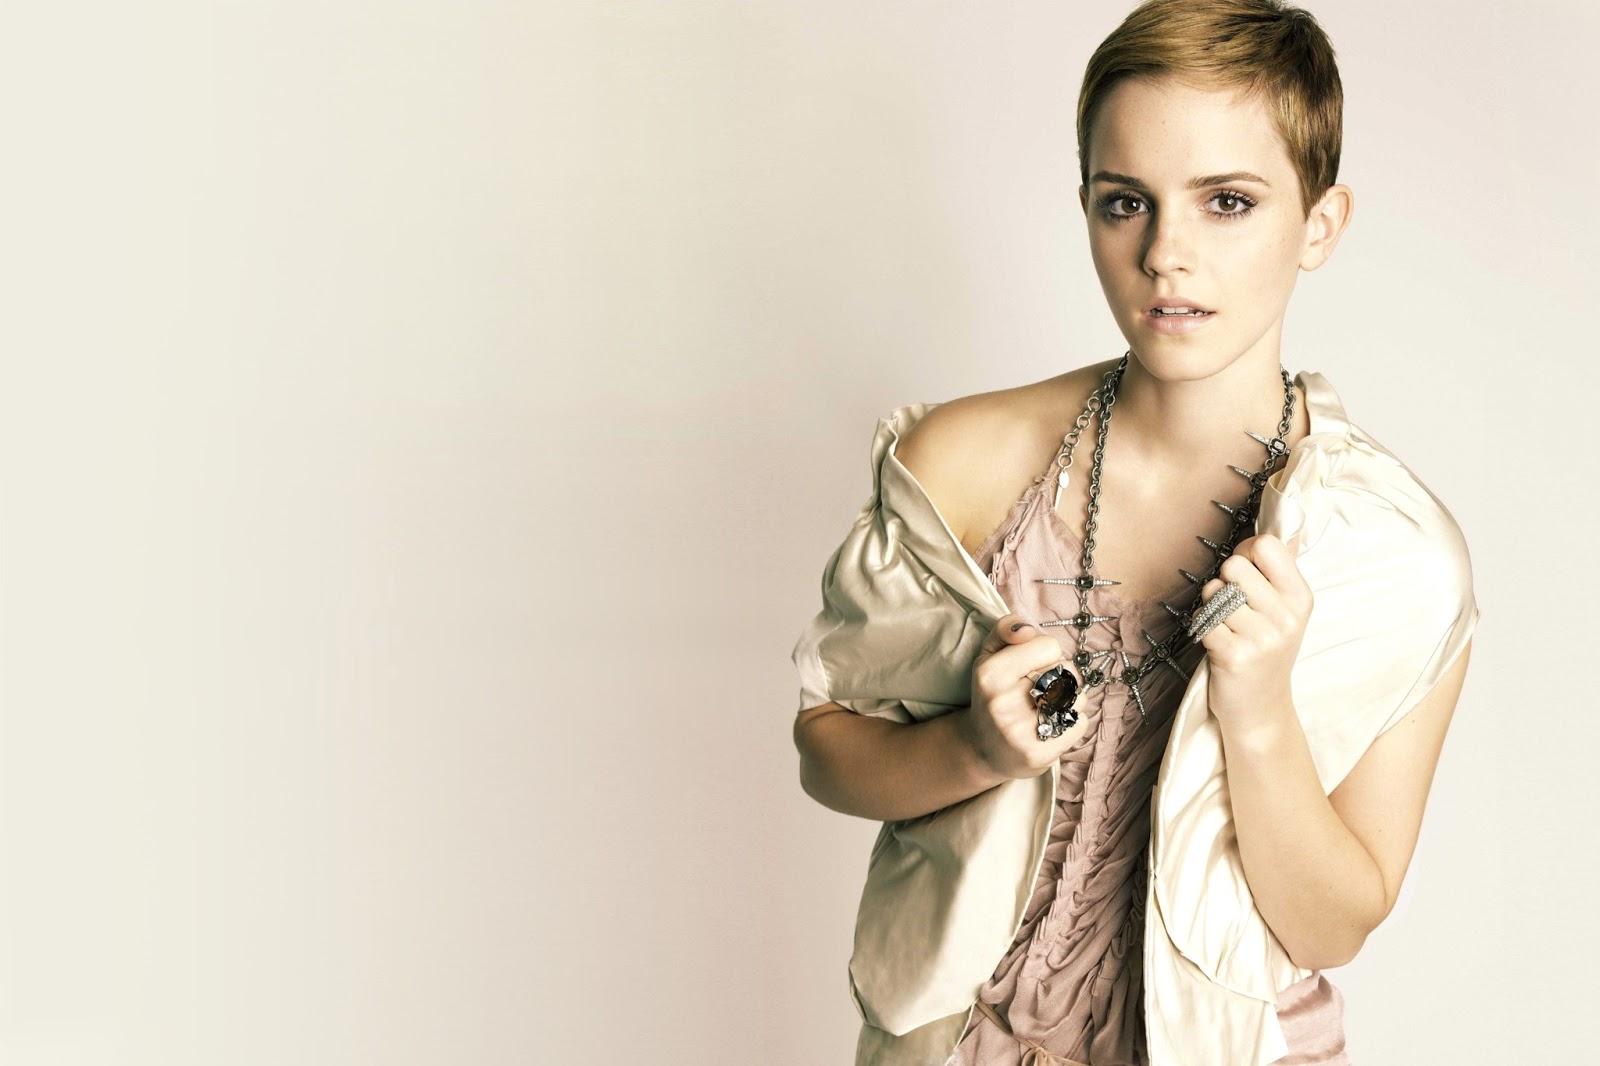 Emma Watson Latest HD wallpapers HD Wallpapers High Definition 1600x1066